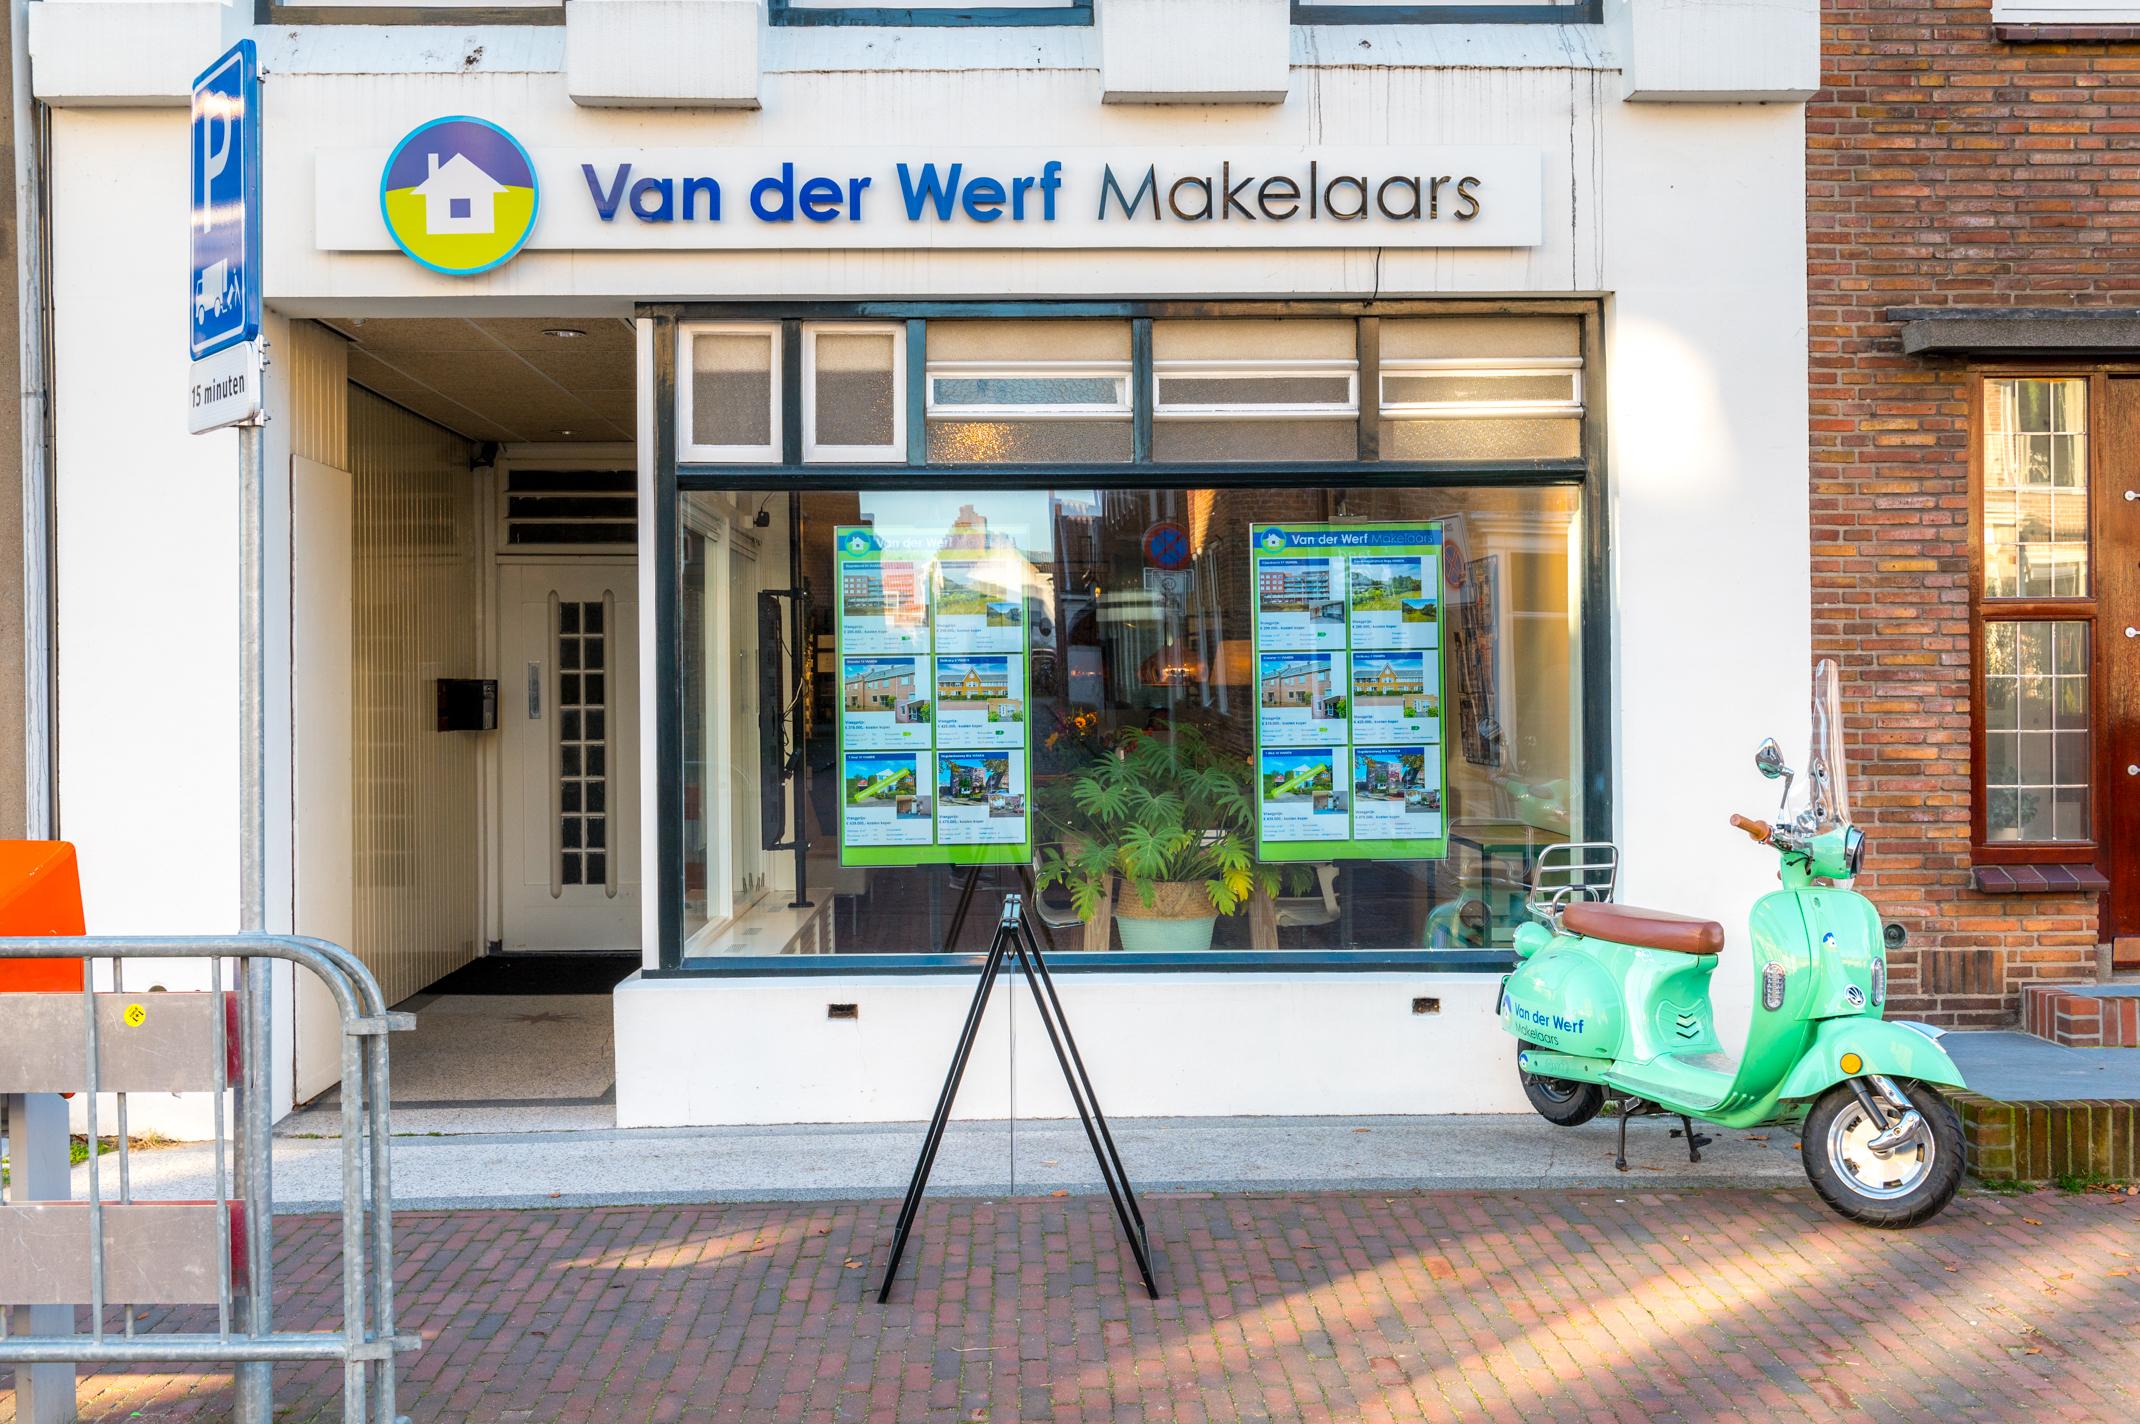 Kantoor Vestiging Van der Werf Makelaars